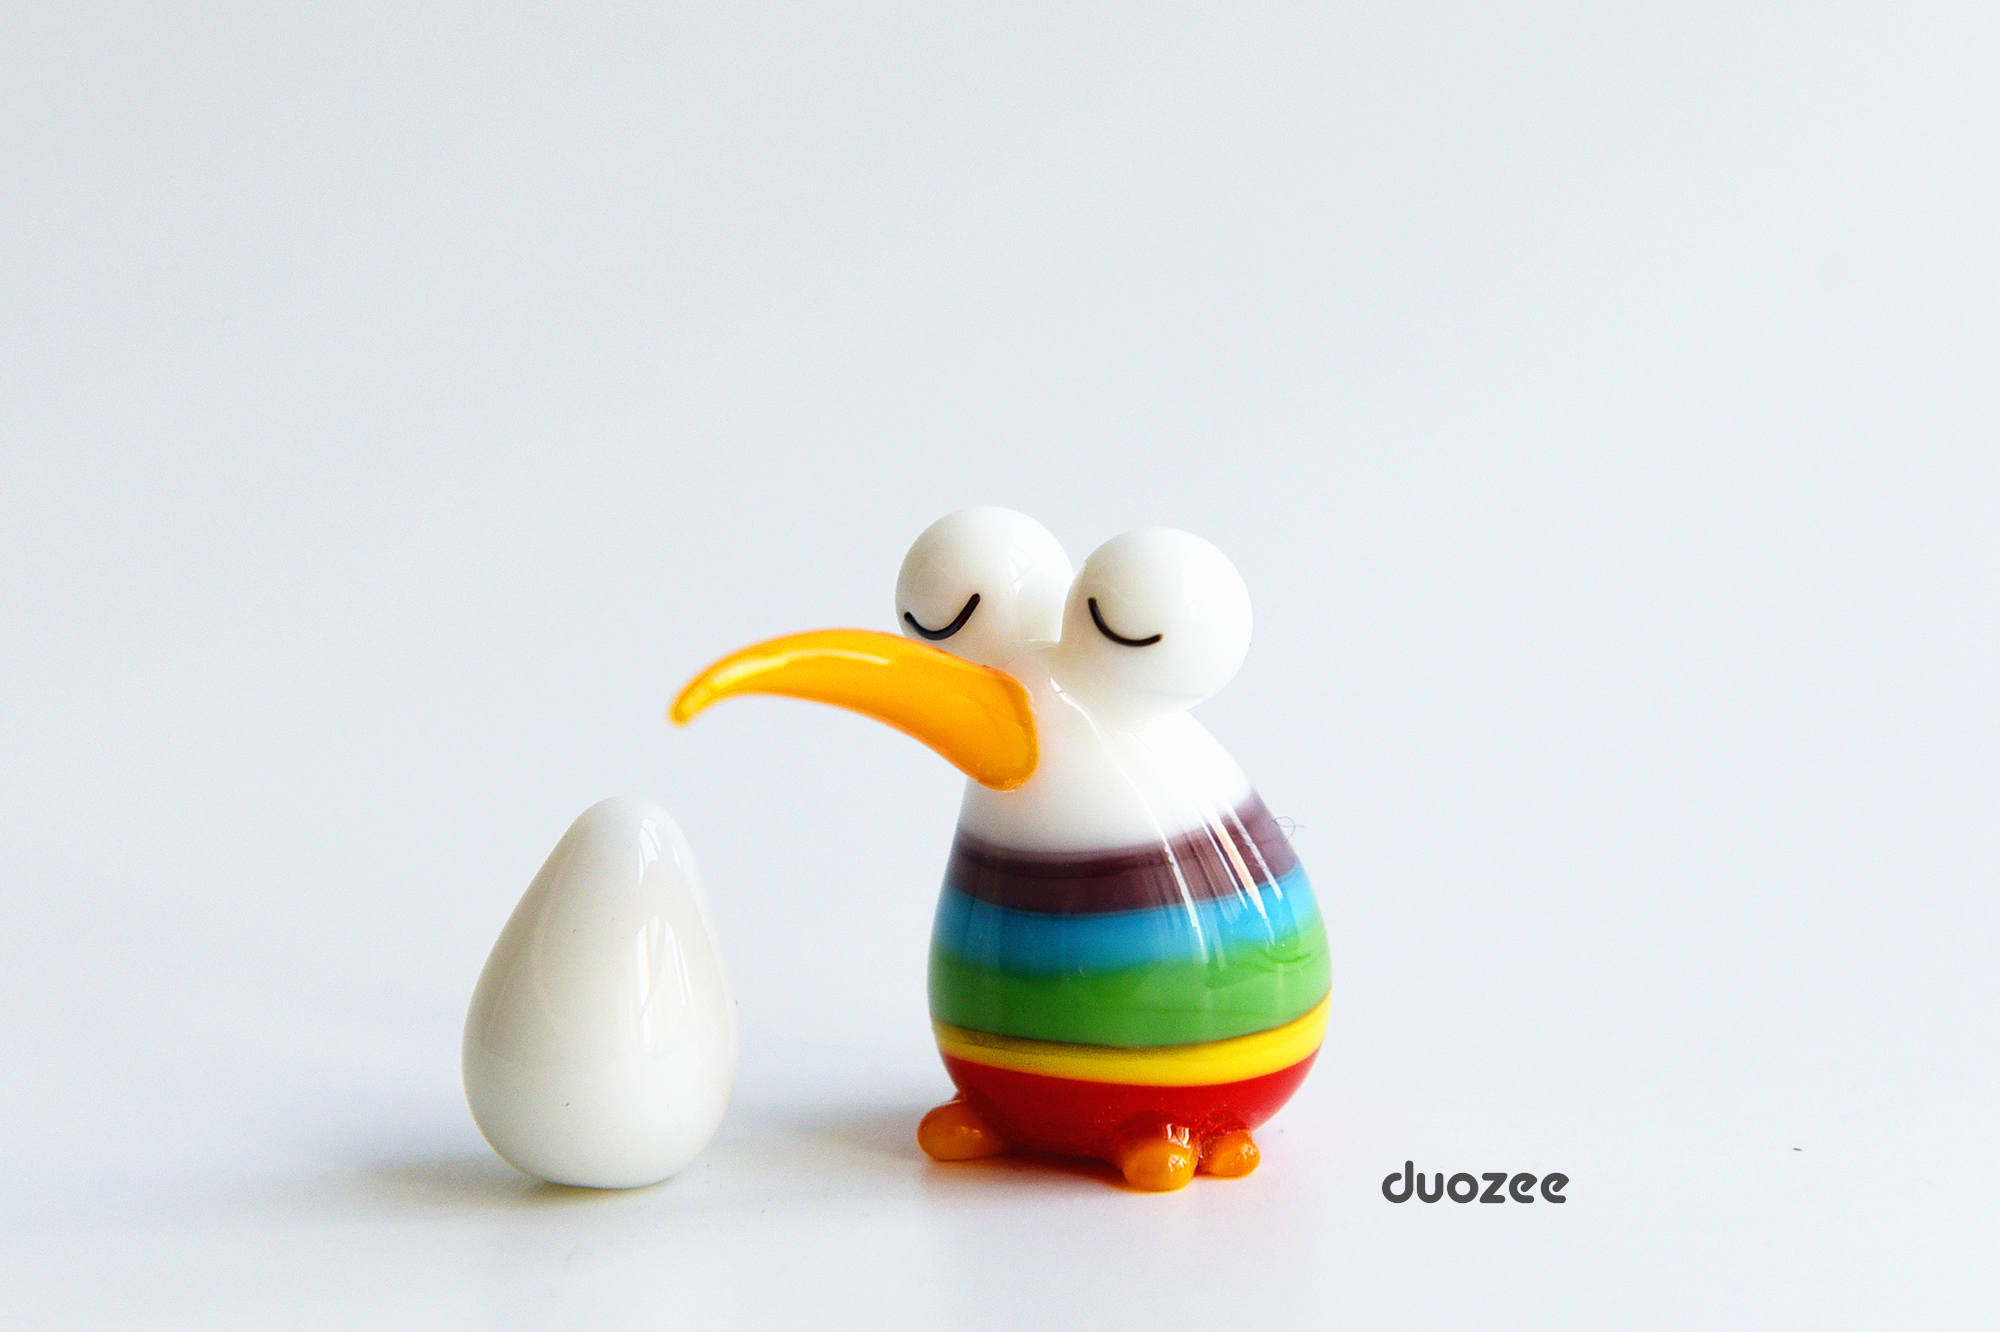 duozee 0